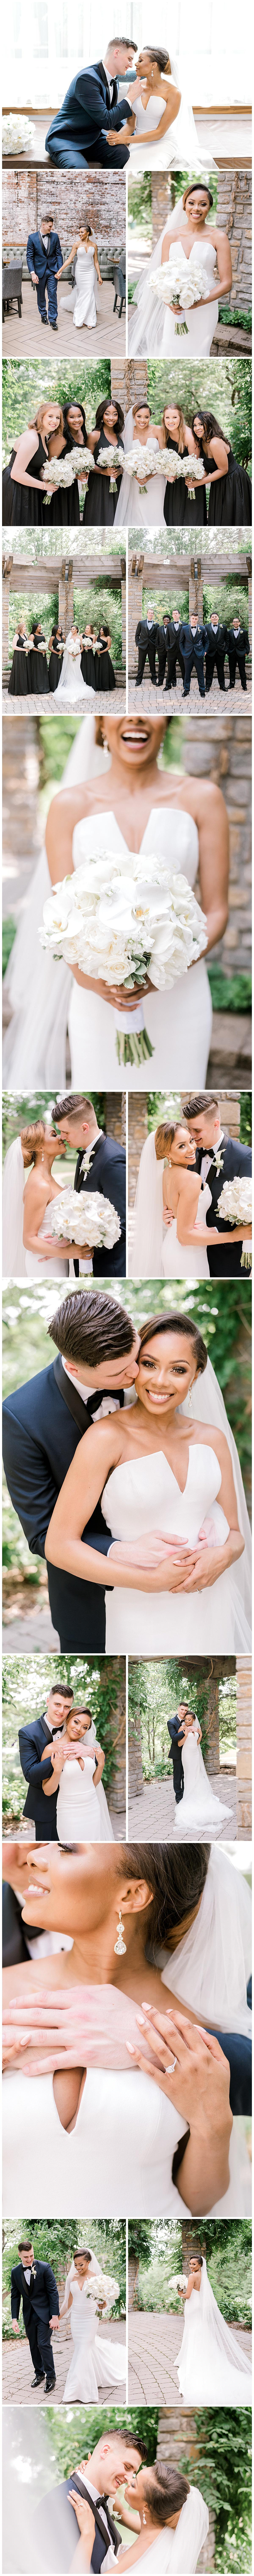 ramiyah and tommy's wedding hotel covington chapel lane photography 3